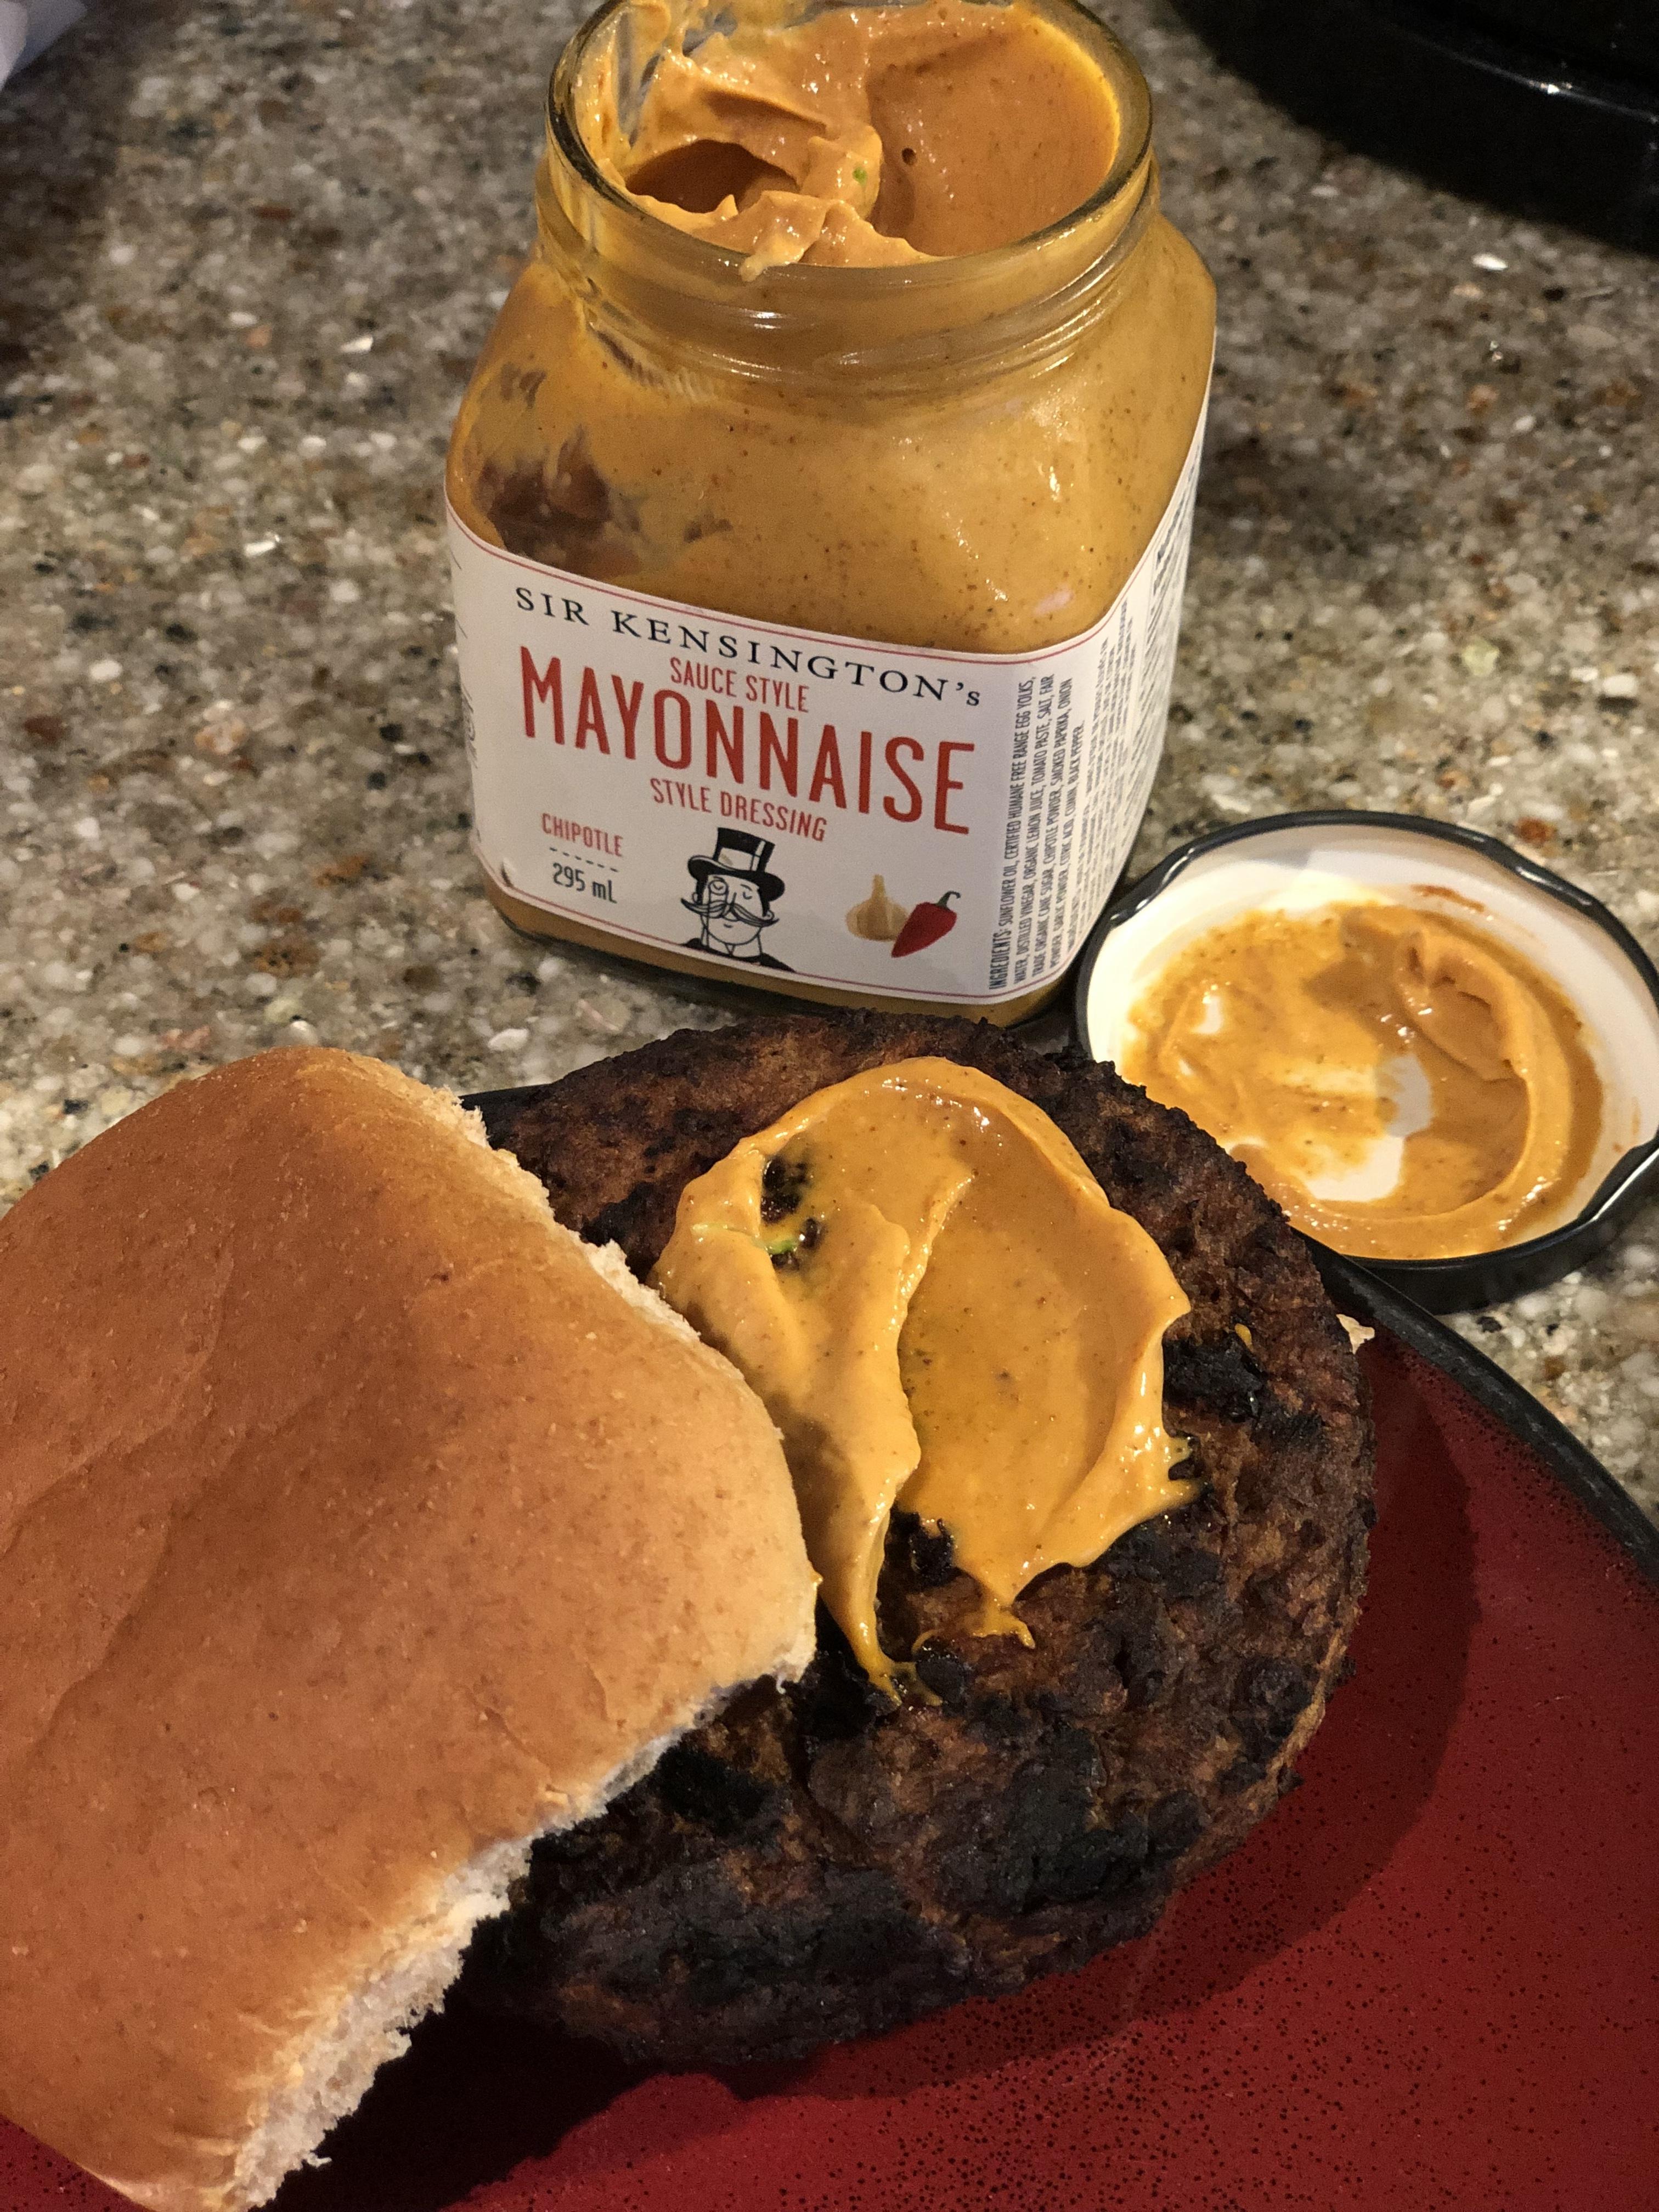 Sir Kensington S Chipotle Mayonnaise Reviews In Condiment Chickadvisor